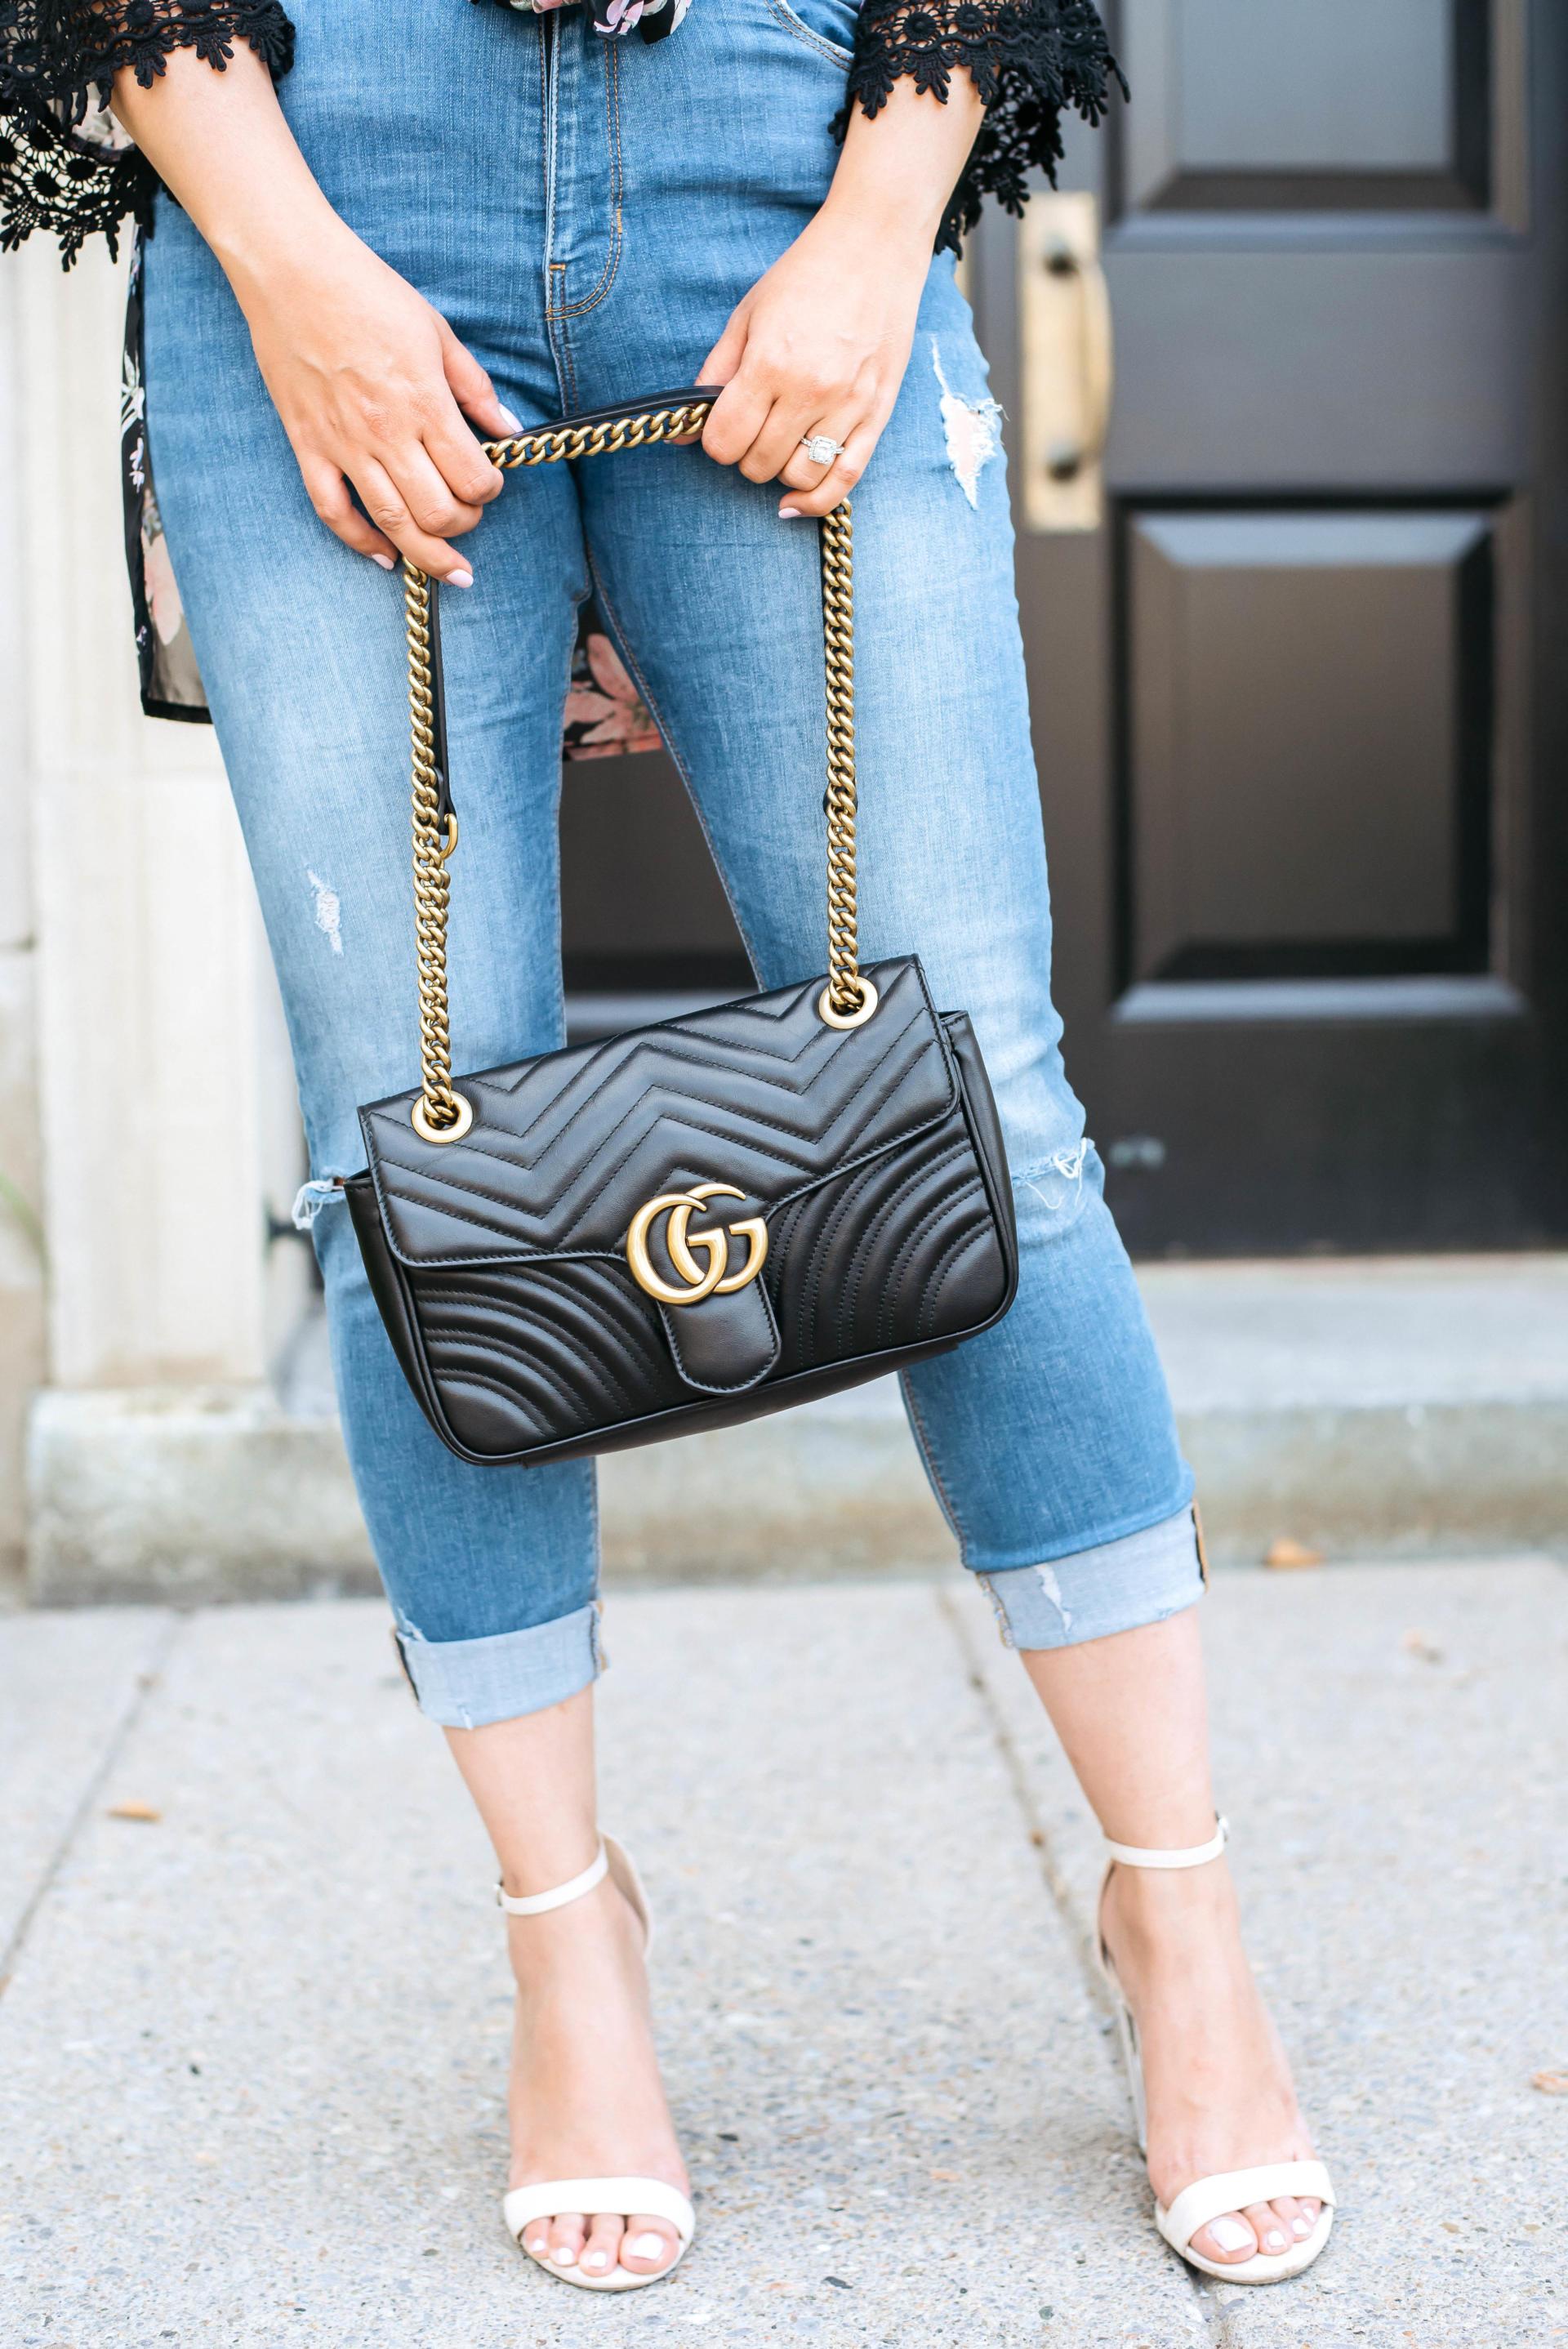 Gucci Marmont Bag | Black Floral Kimono